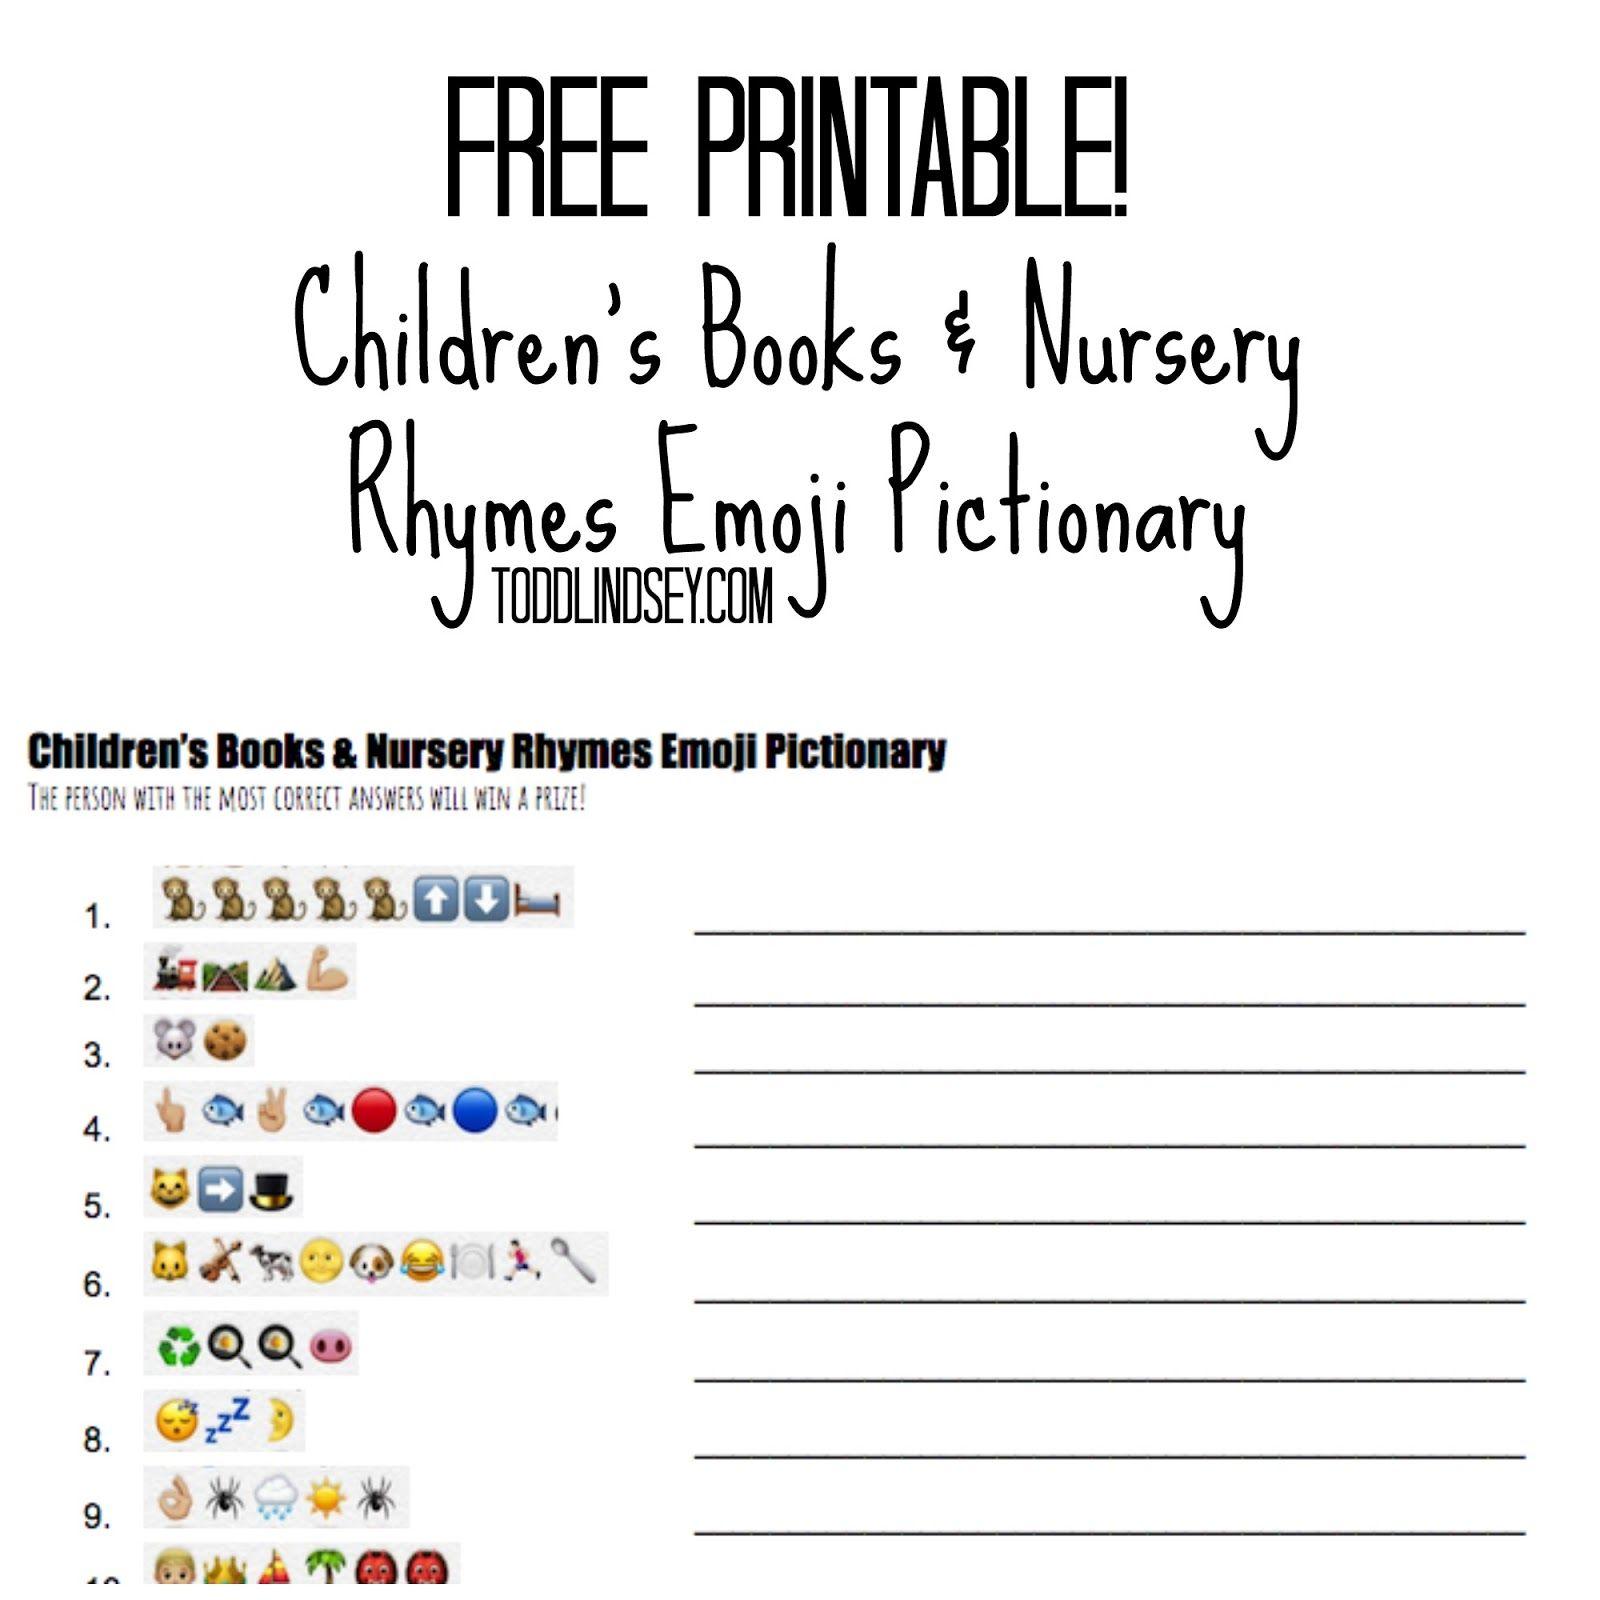 Free Printable Children S Books Amp Nursery Rhymes Emoji Pictionary